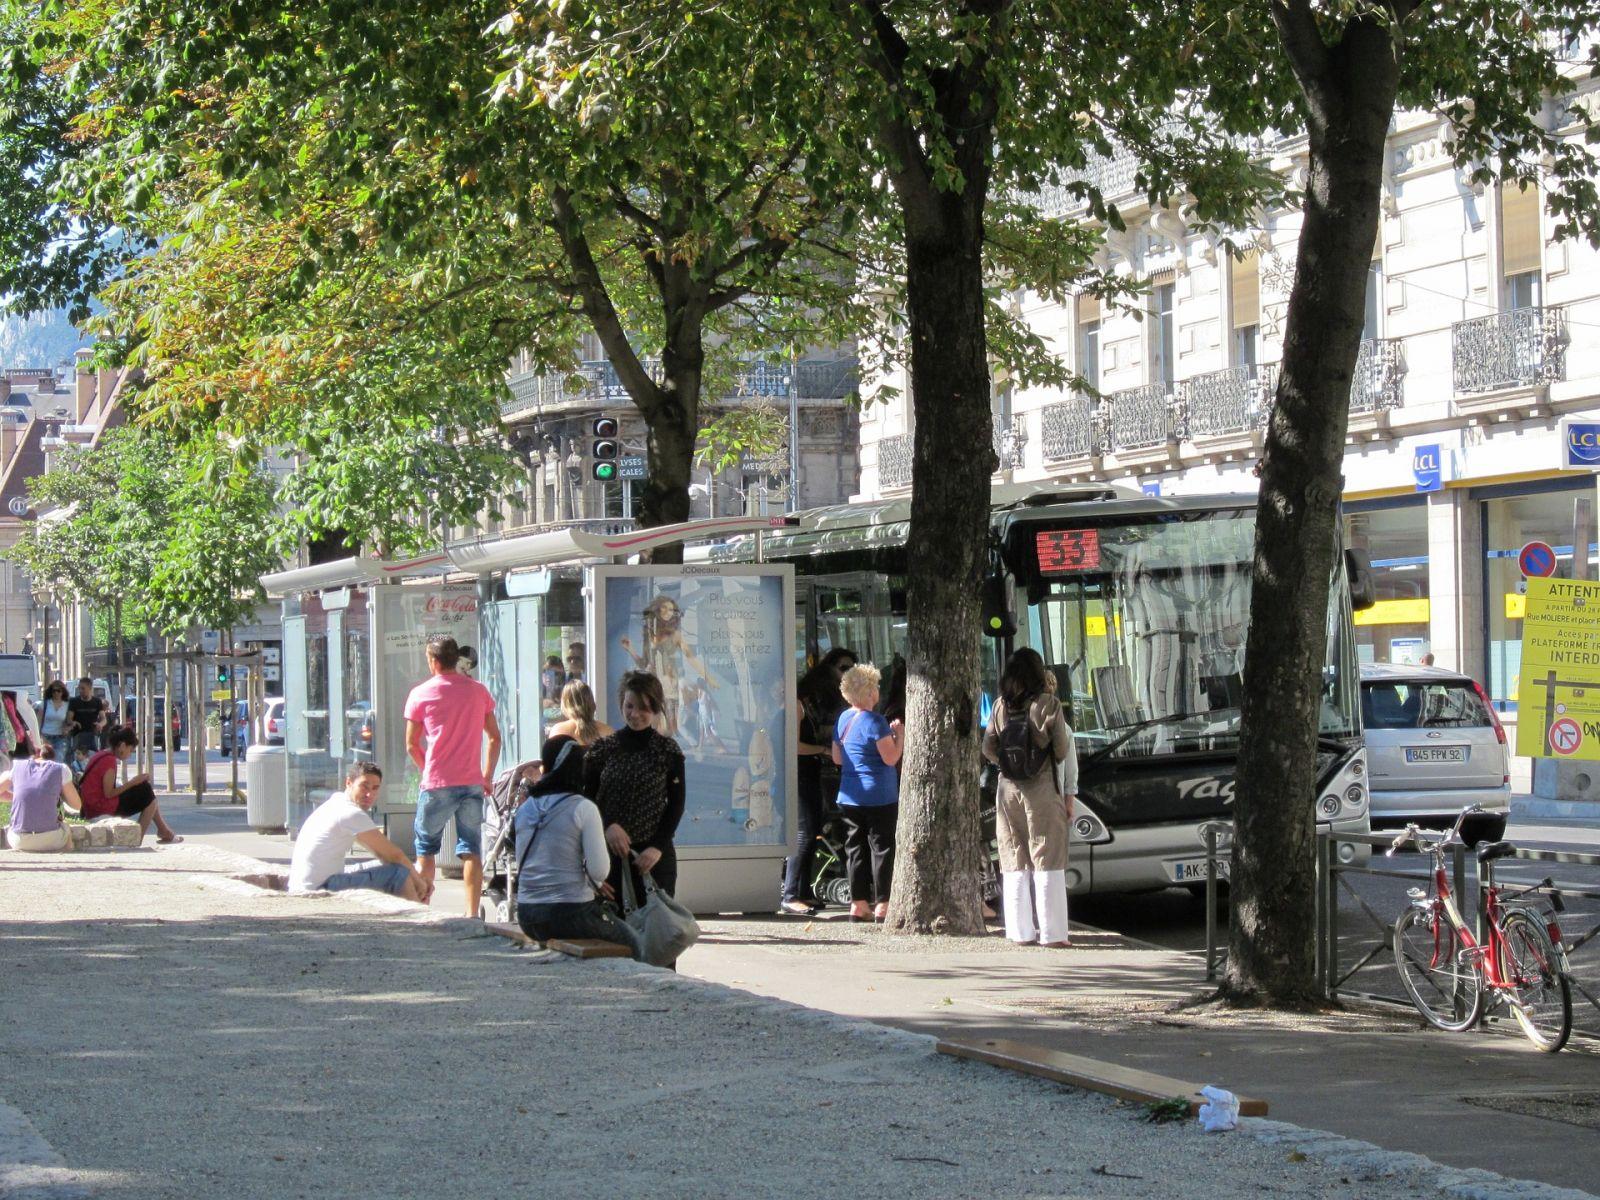 Investissement immobilier locatif à Grenoble